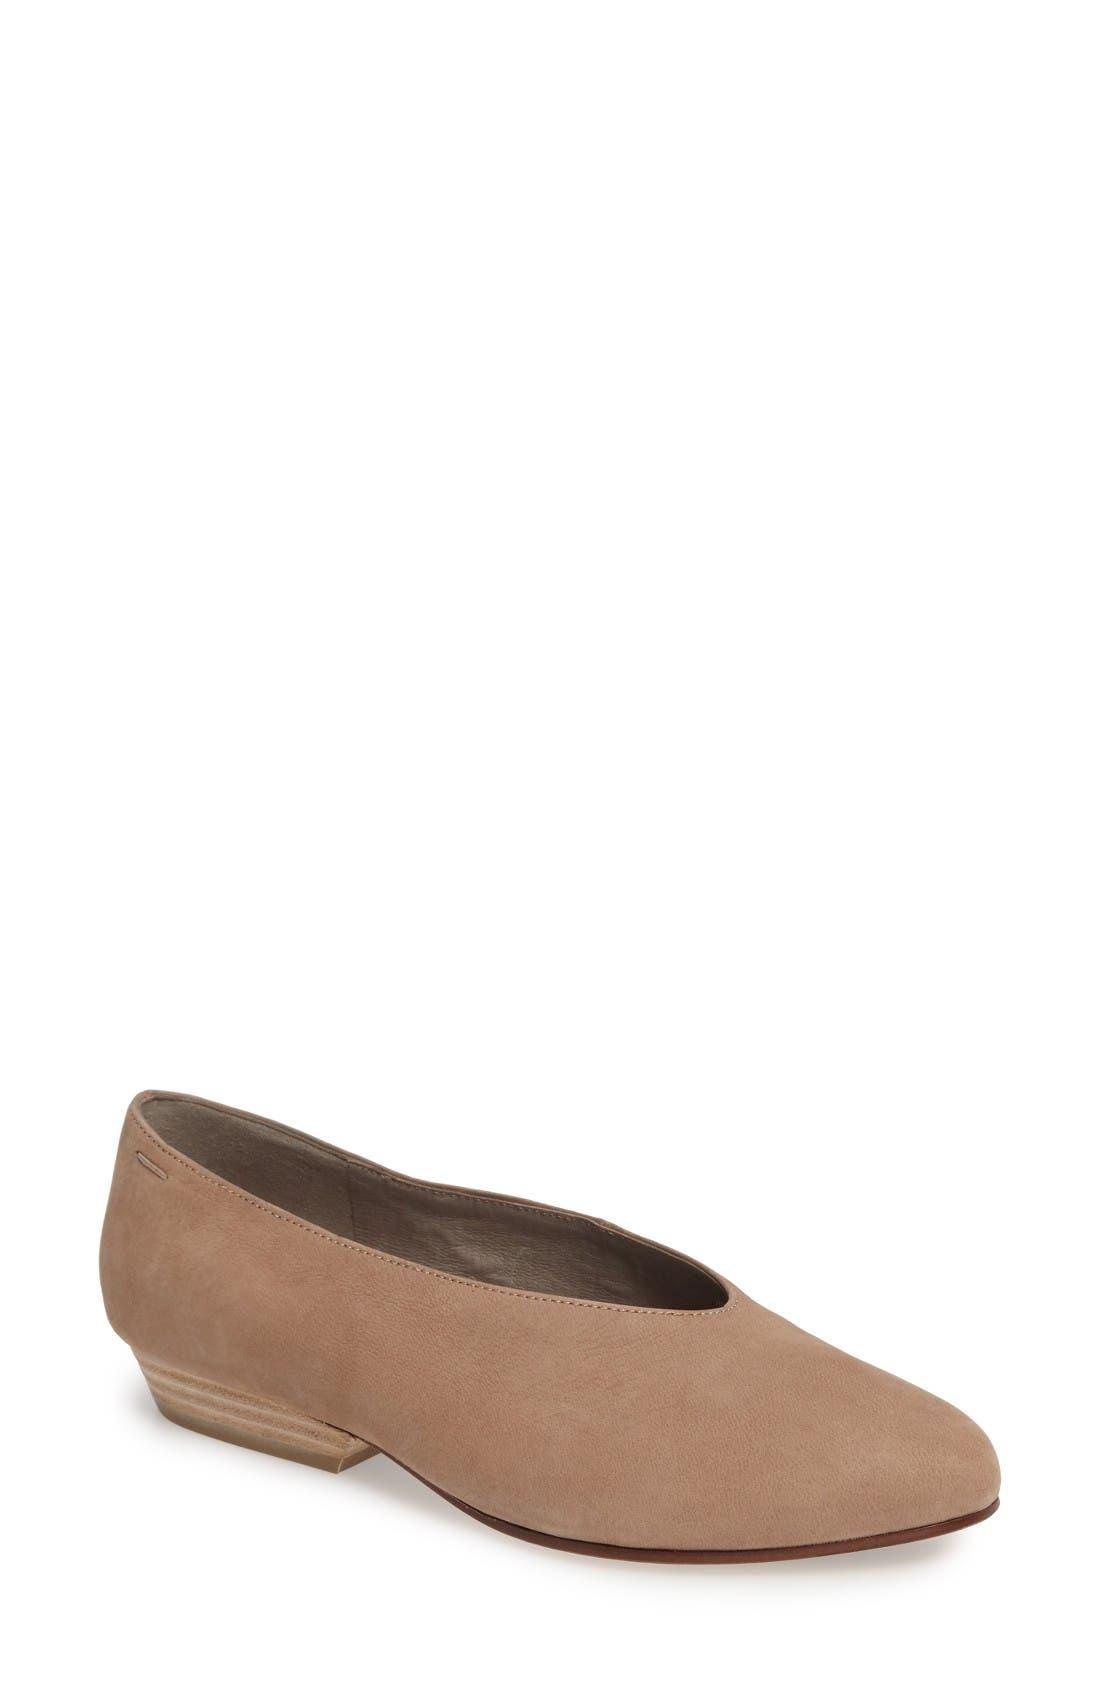 Alternate Image 1 Selected - Eileen Fisher Sabin Glove Shoe (Women)